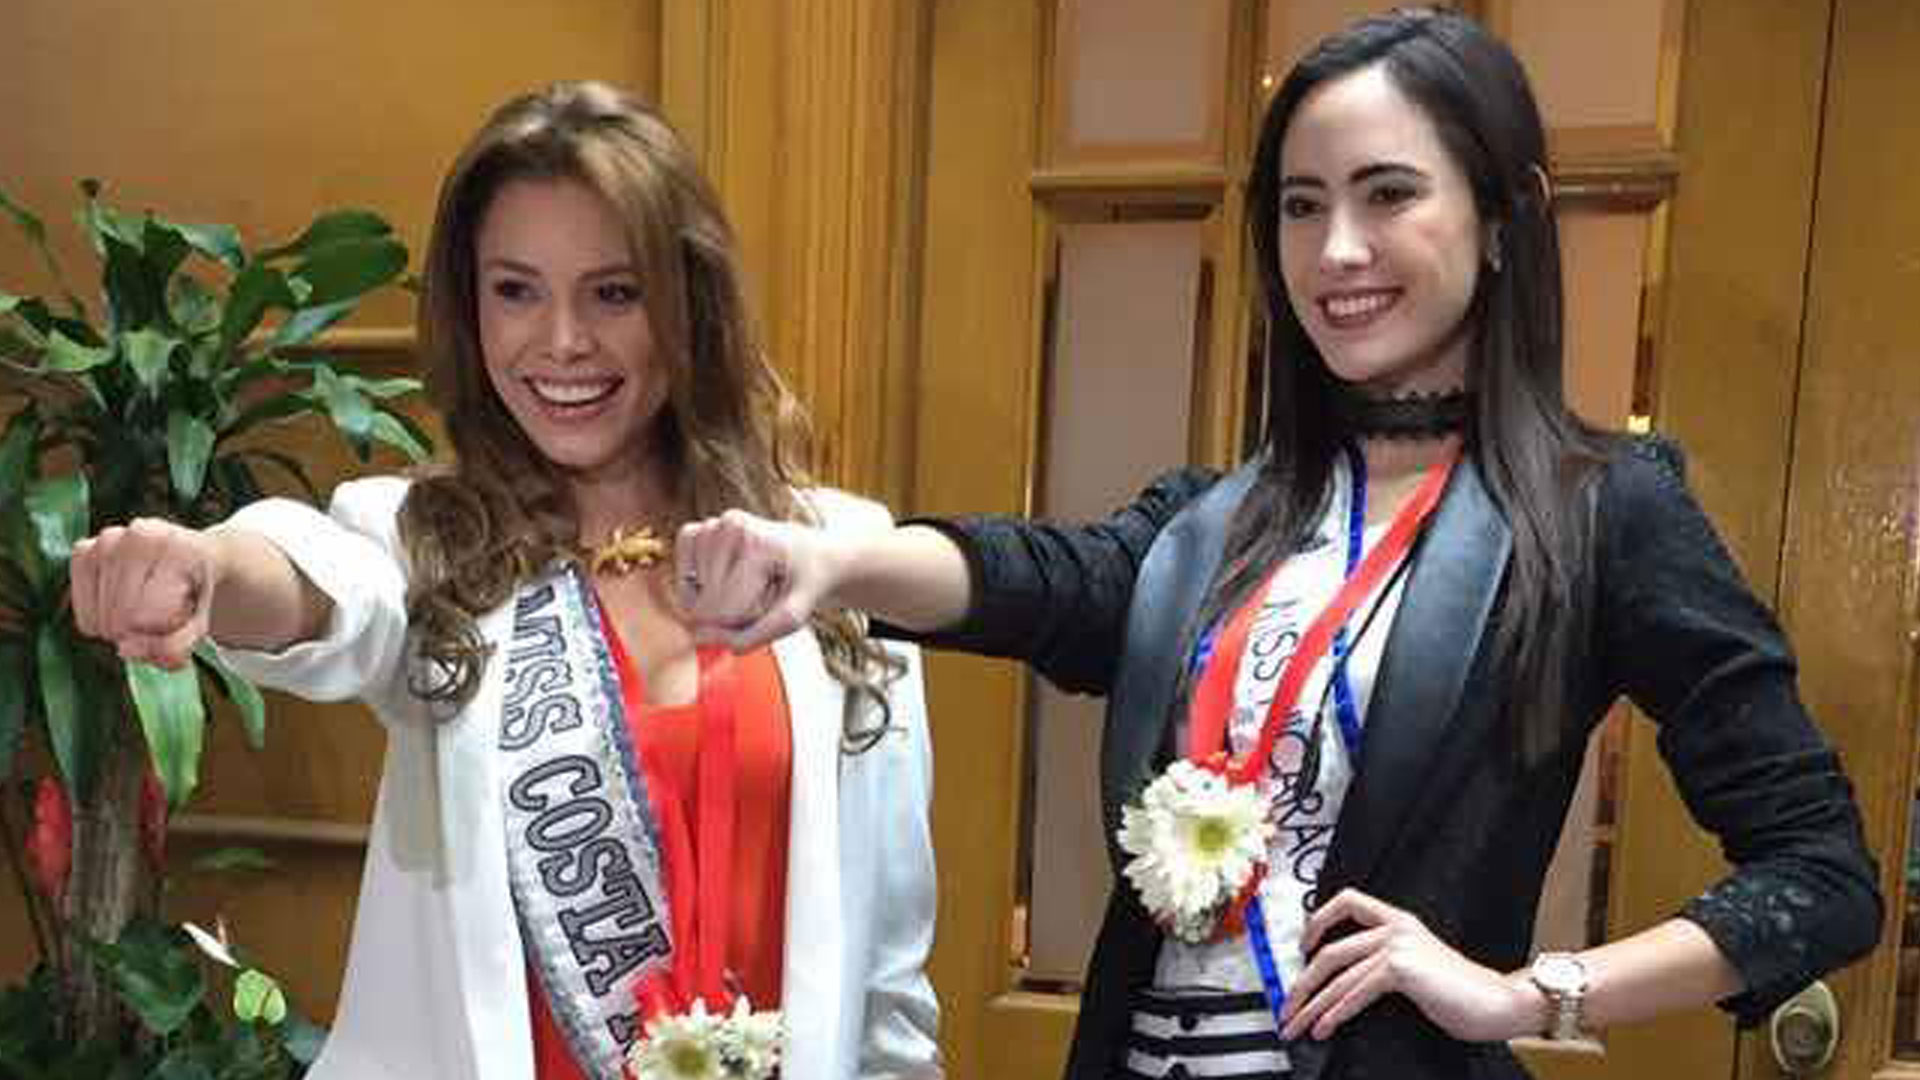 Marina Jacoby Wins Miss Nicaragua 2016: El Gesto De Miss Costa Rica Y Miss Nicaragua, De Miss